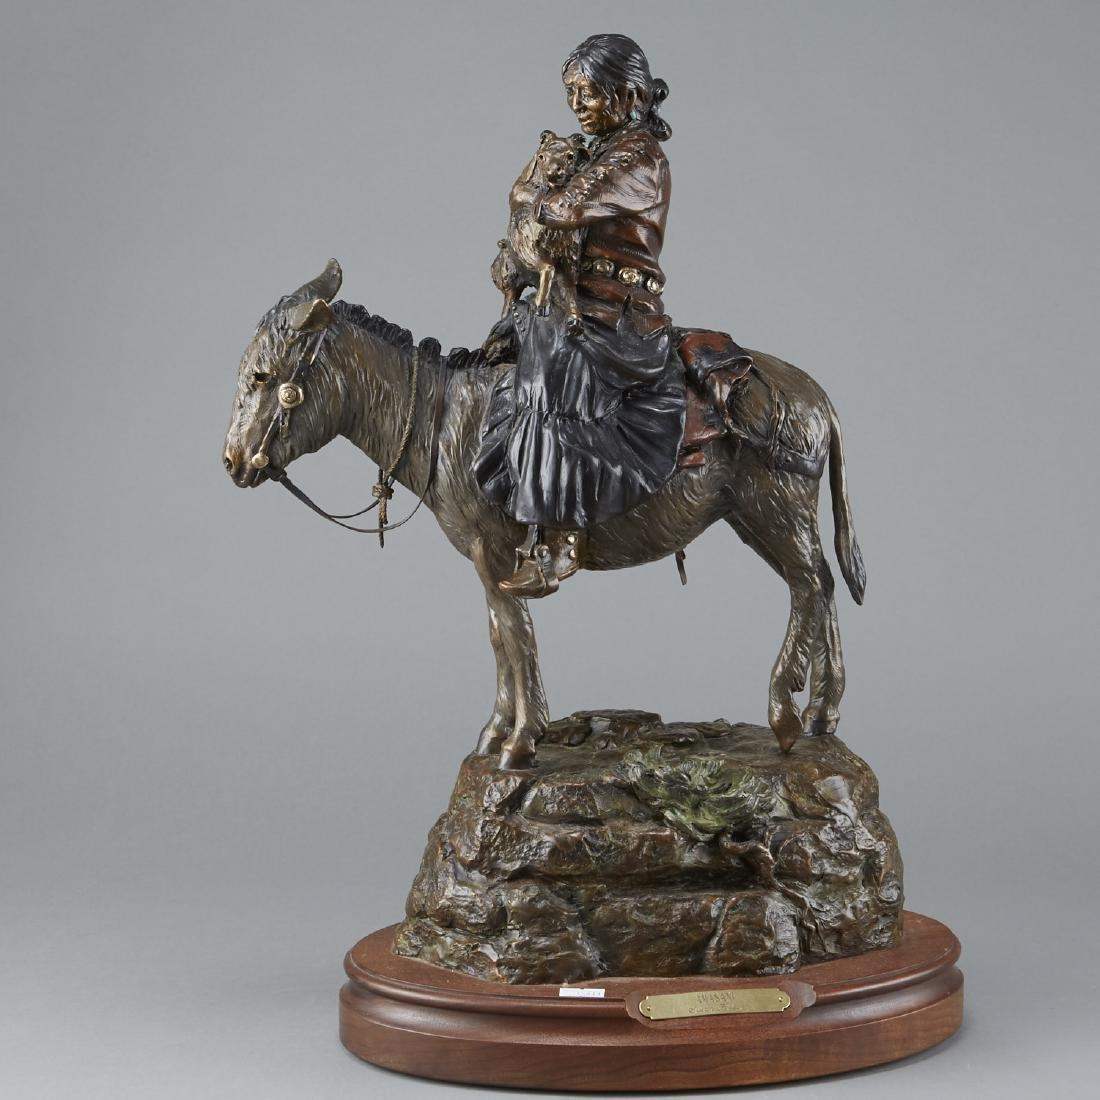 Susan Kliewer Bronze of Woman on Horseback